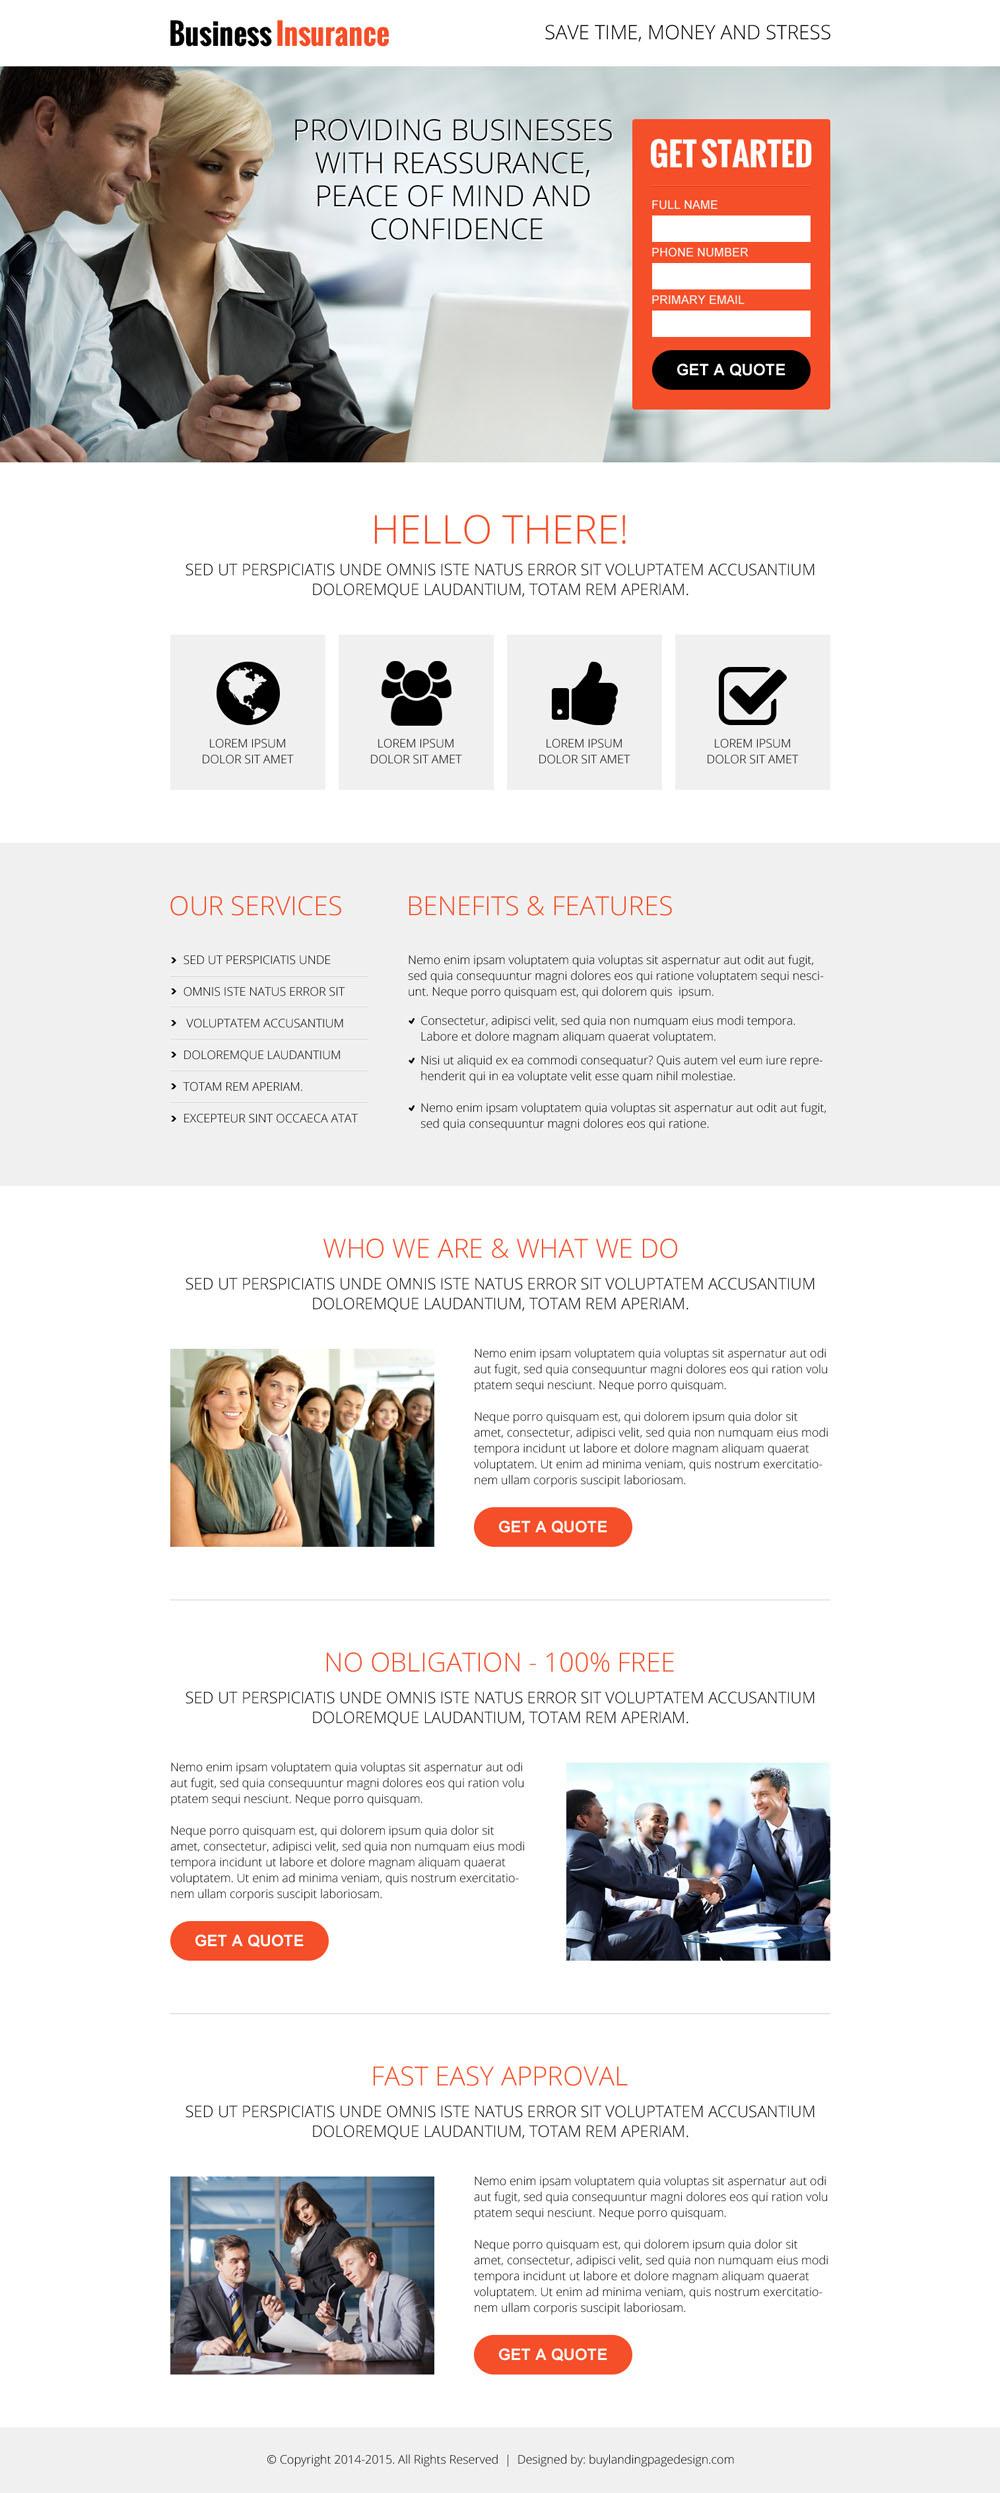 business-insurance-lead-capture-conversion-centered-landing-page-design-template-015